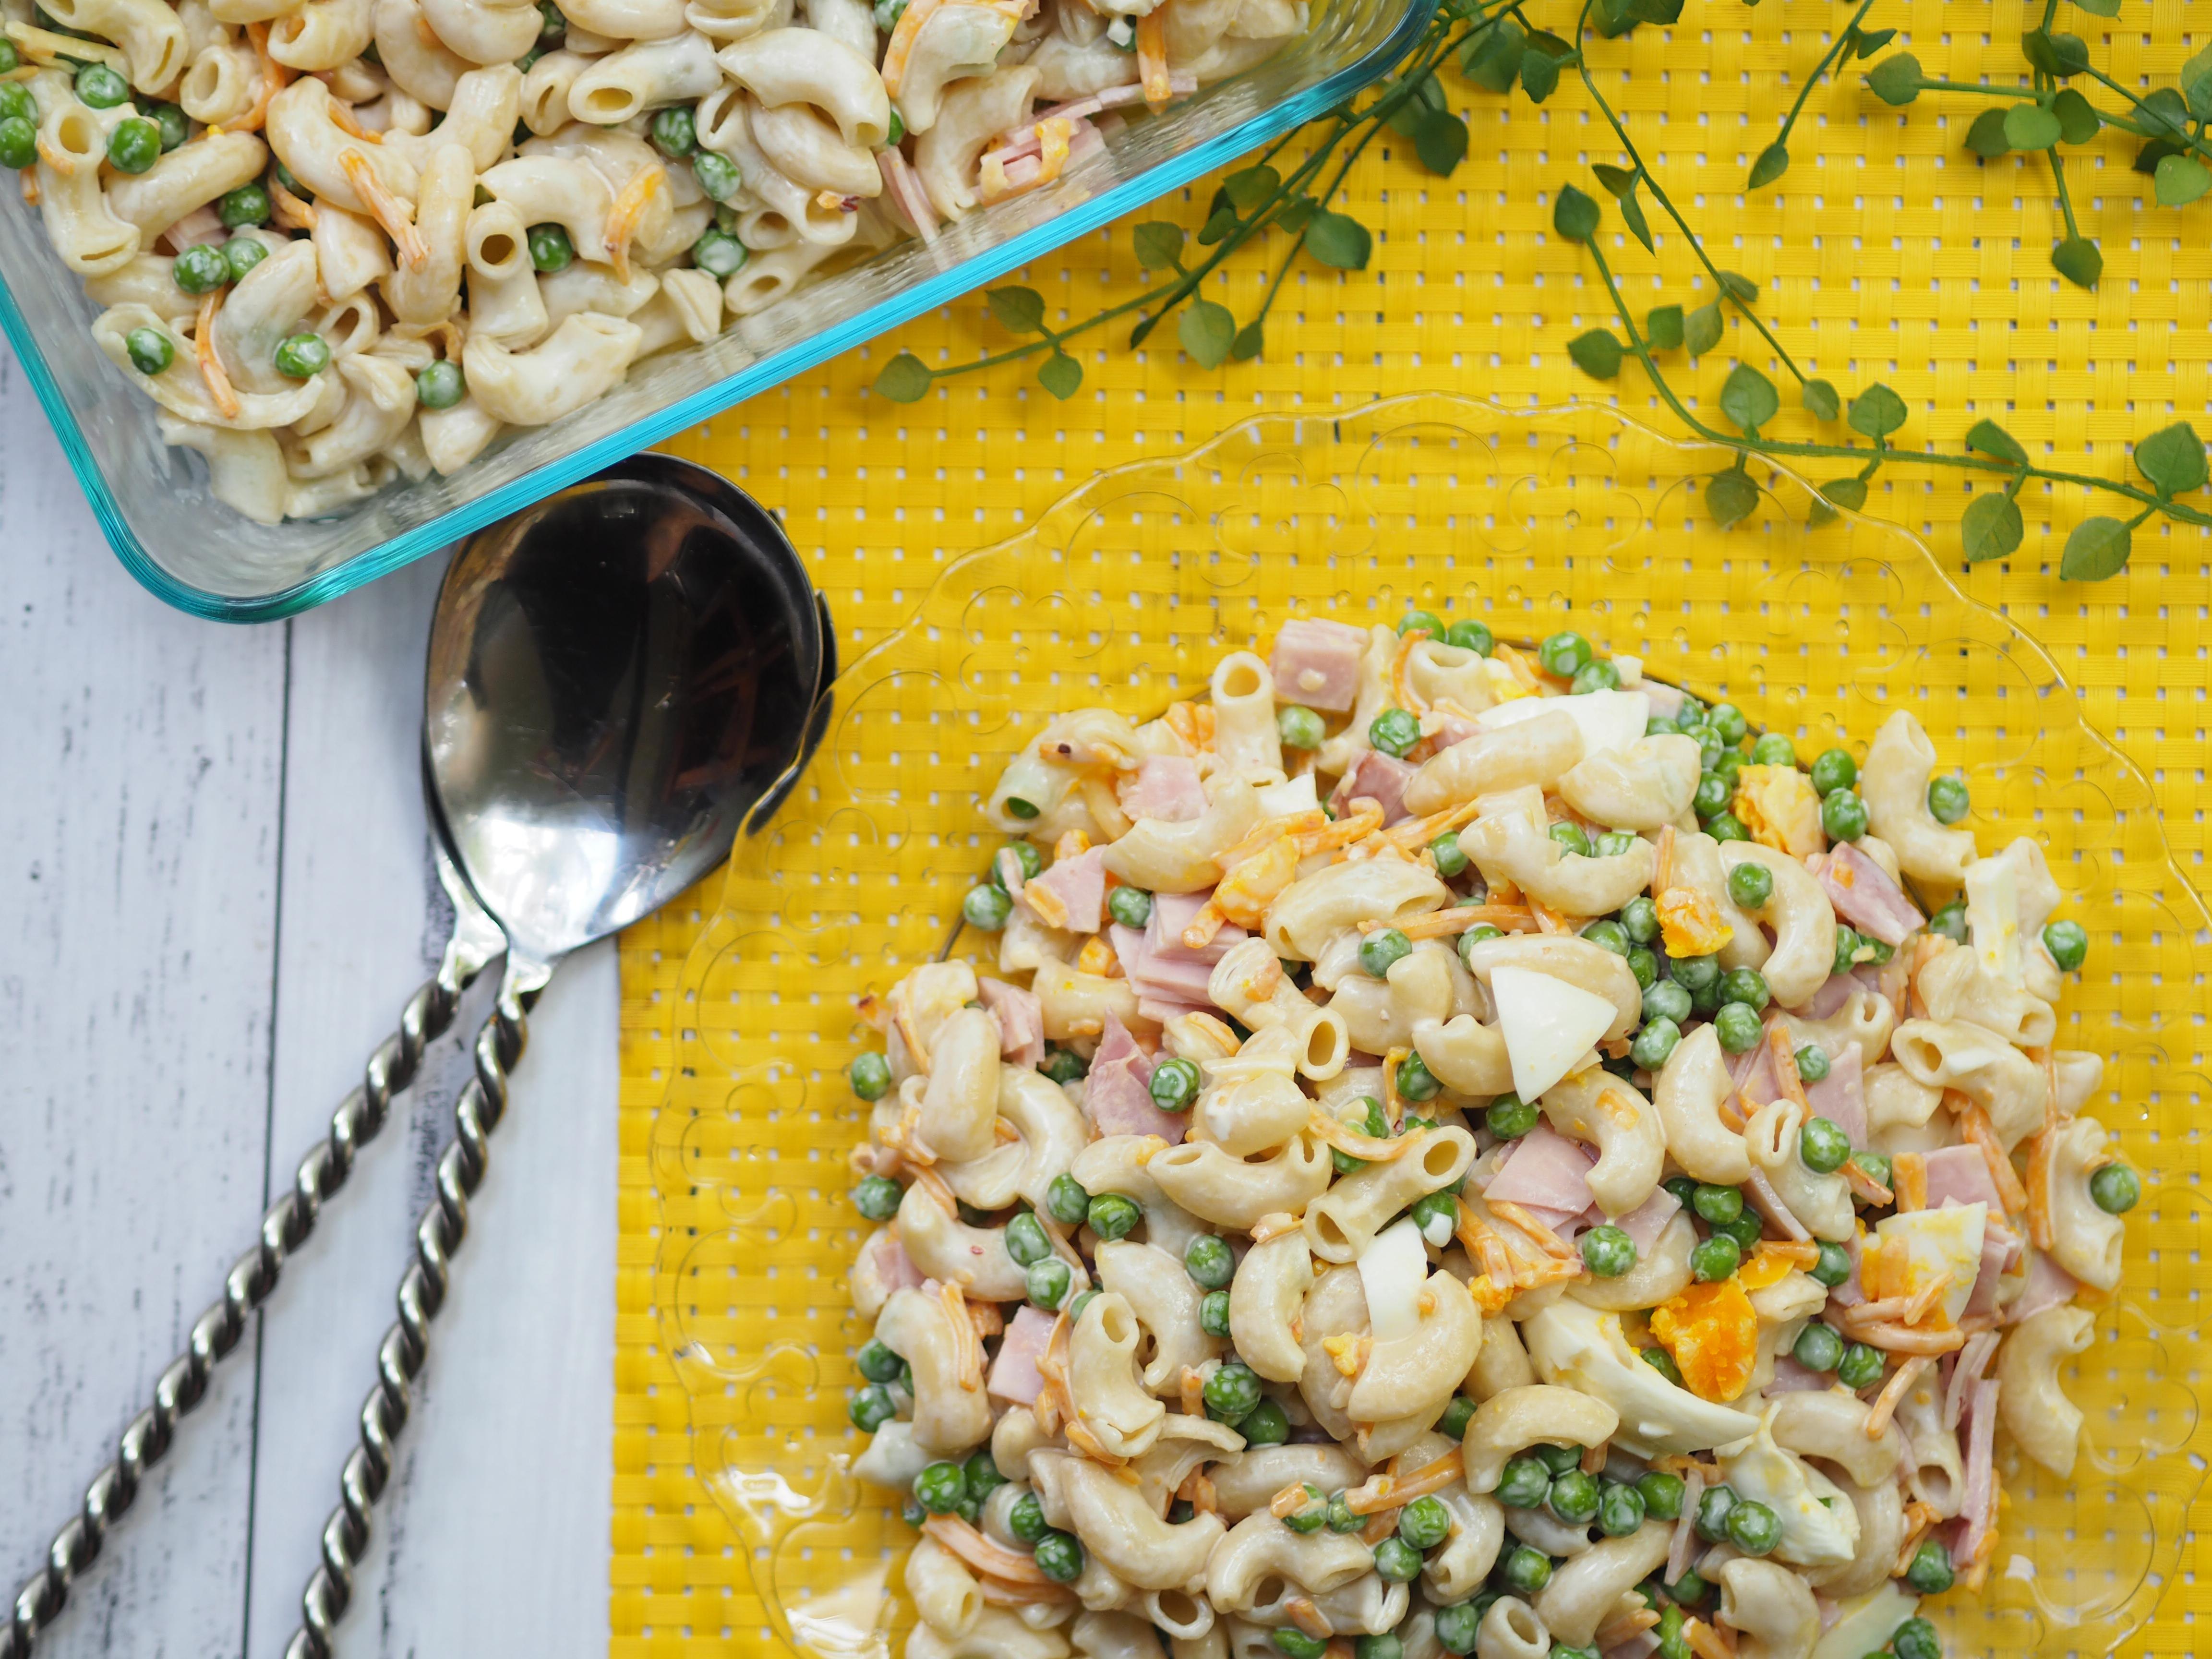 Picnic Salad - One Pot Ham, Pea,Cheese and Egg Pasta Salad